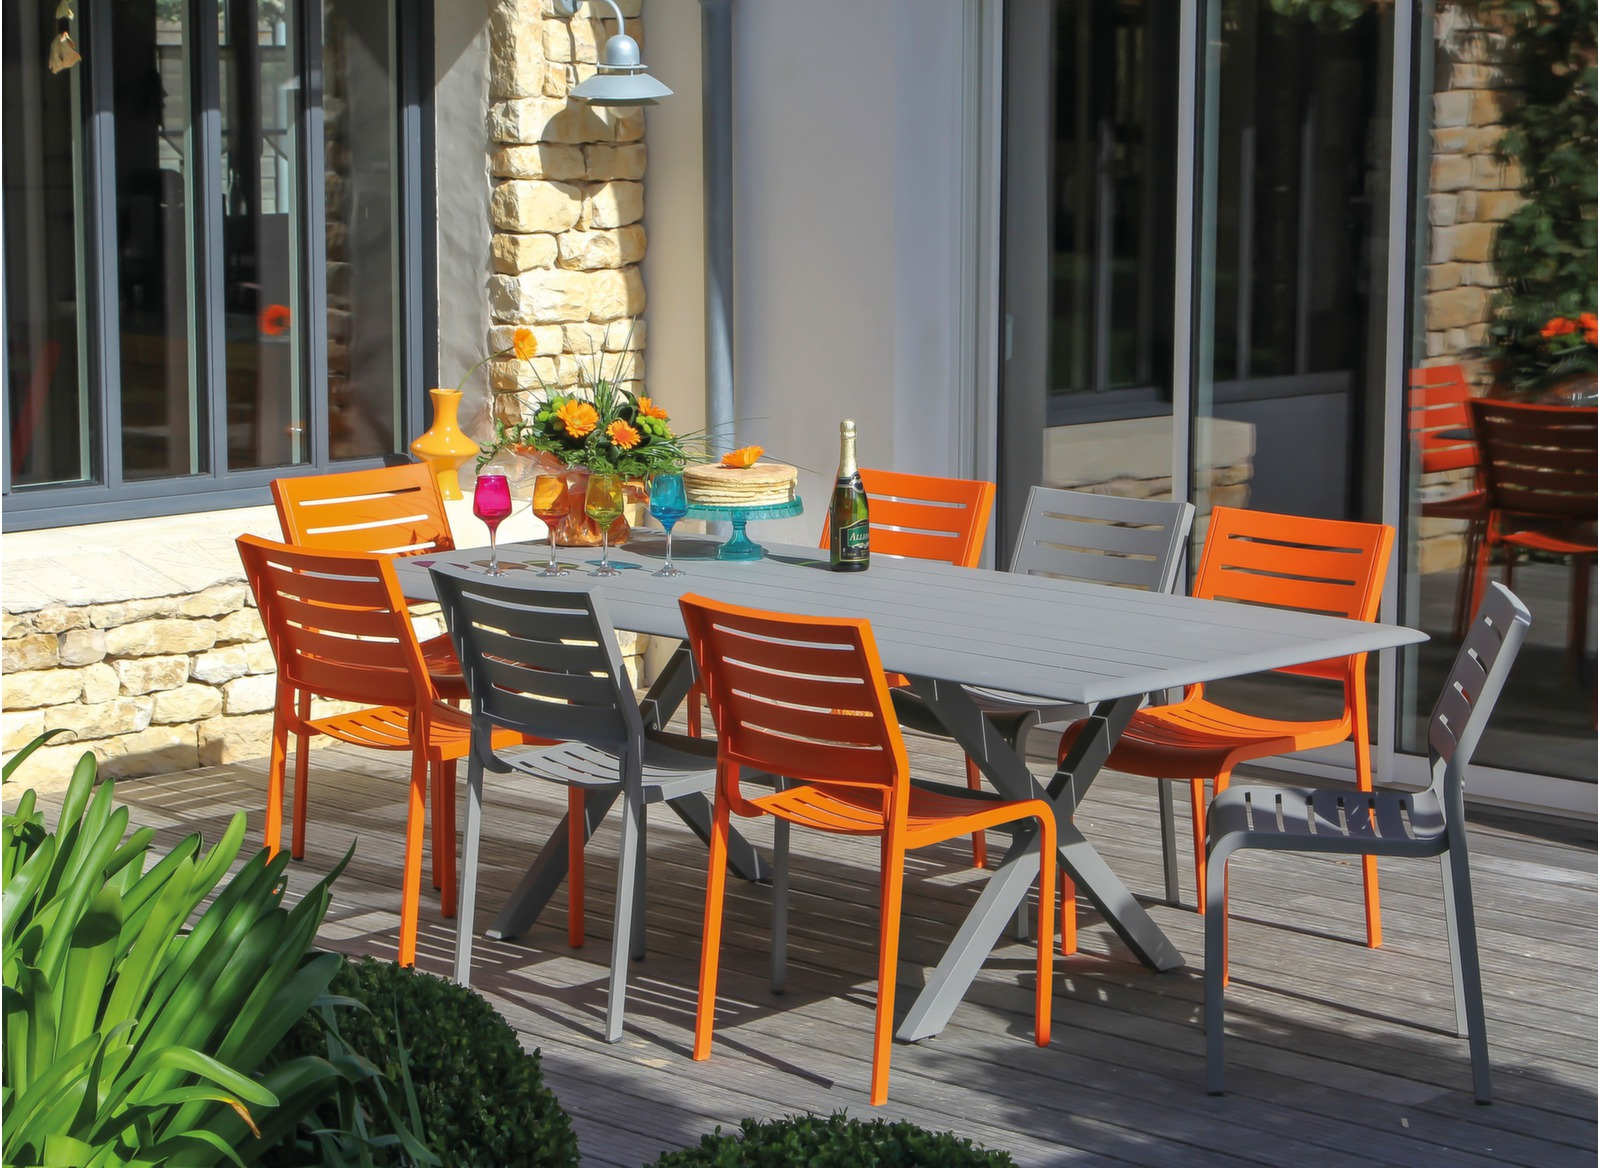 Chaise de jardin belhara promotions meubles de jardin for Salon de jardin couleur